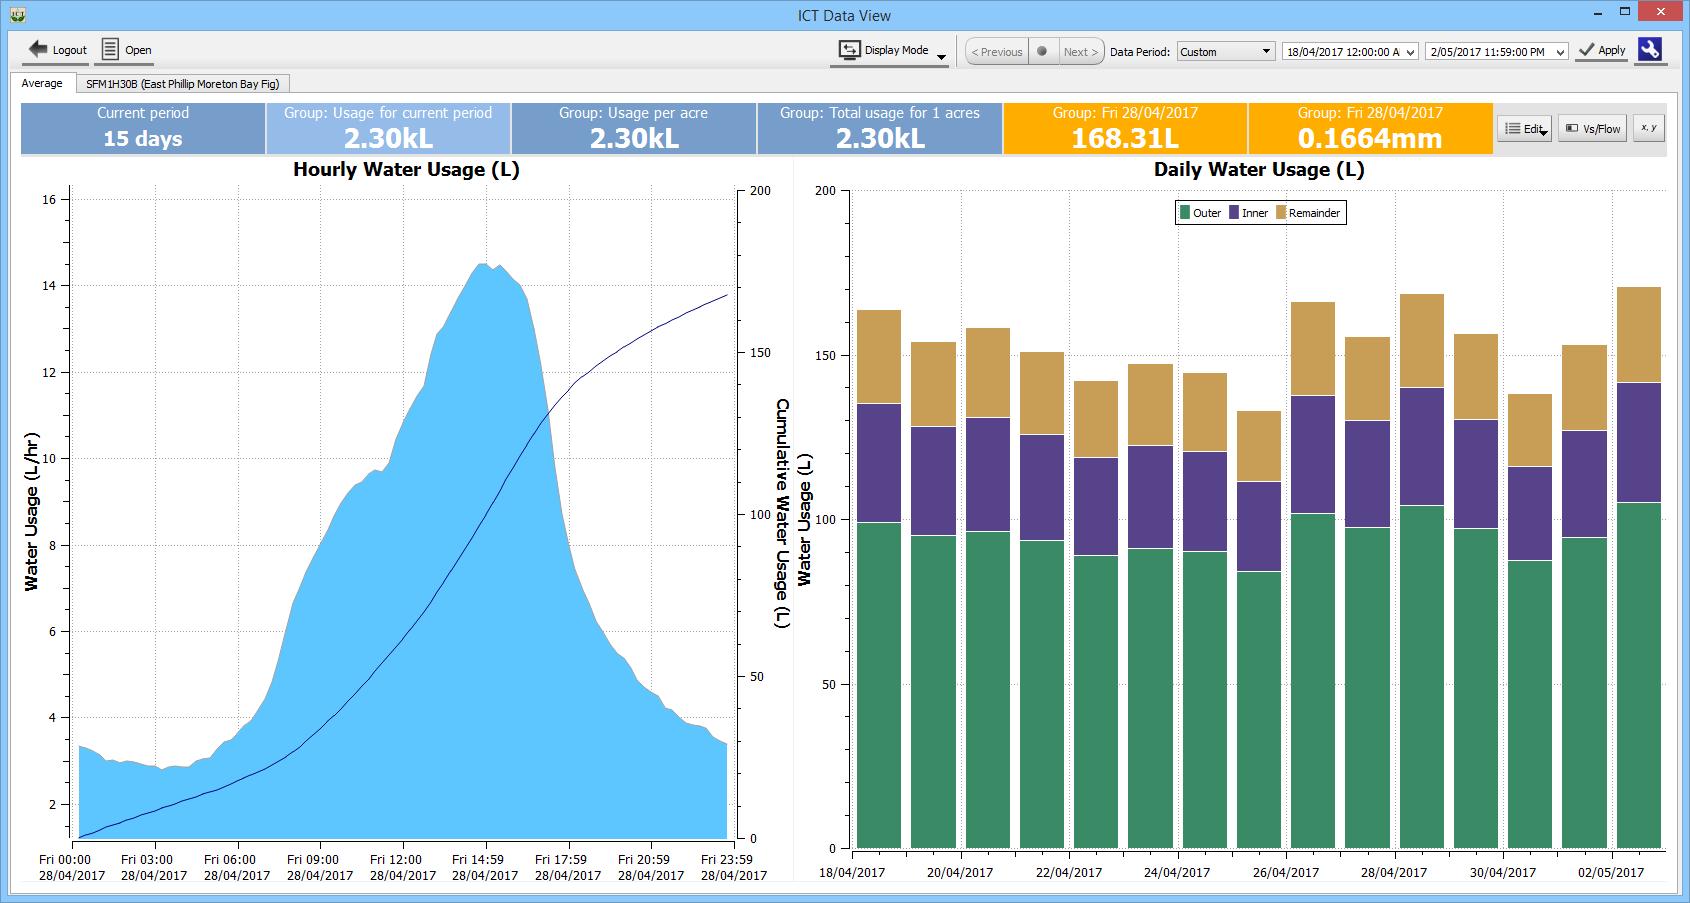 ICT CIS - Cloud Data Analysis and Display